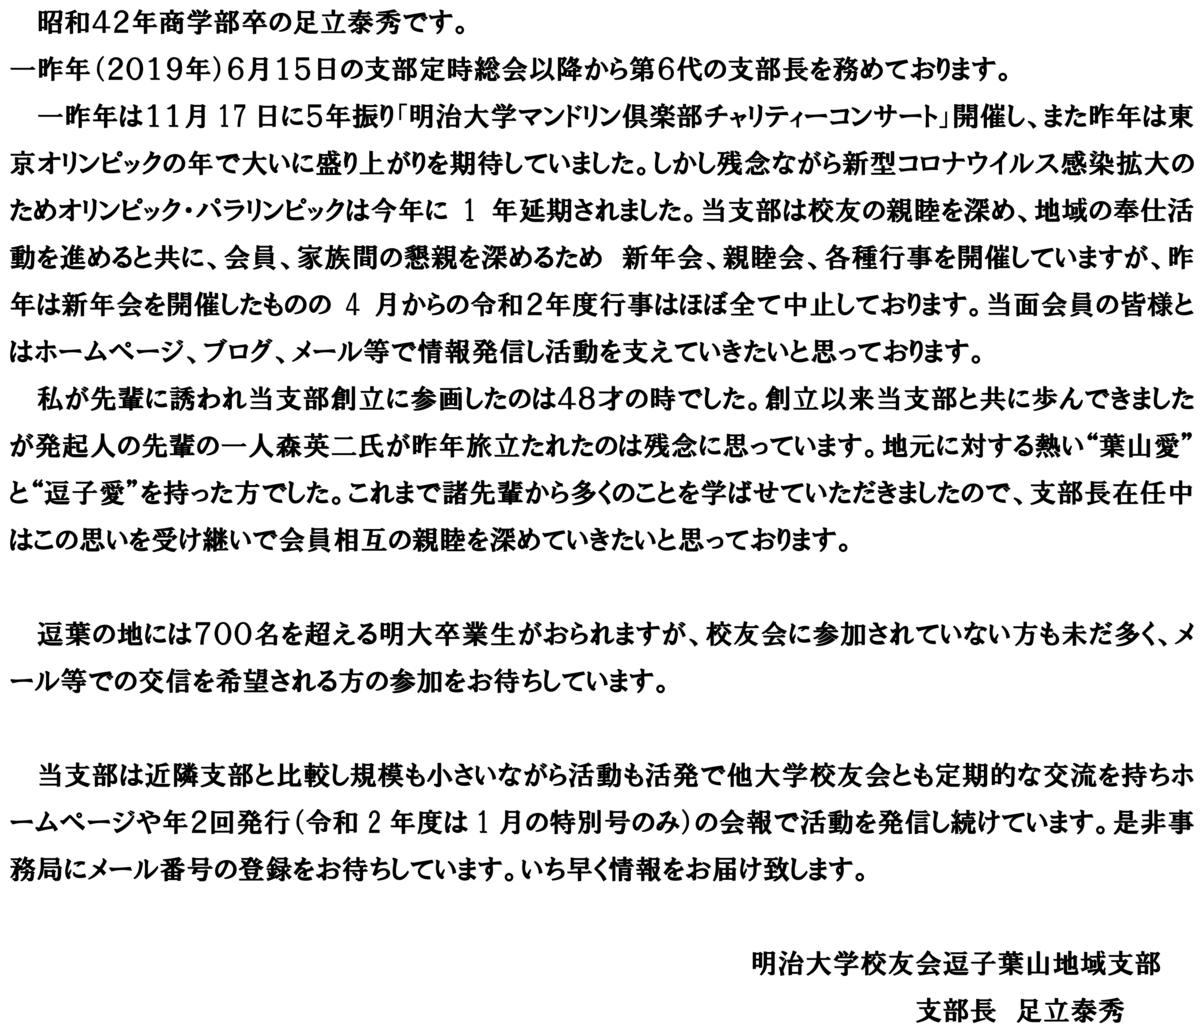 f:id:meijizuyou:20210125071224p:plain